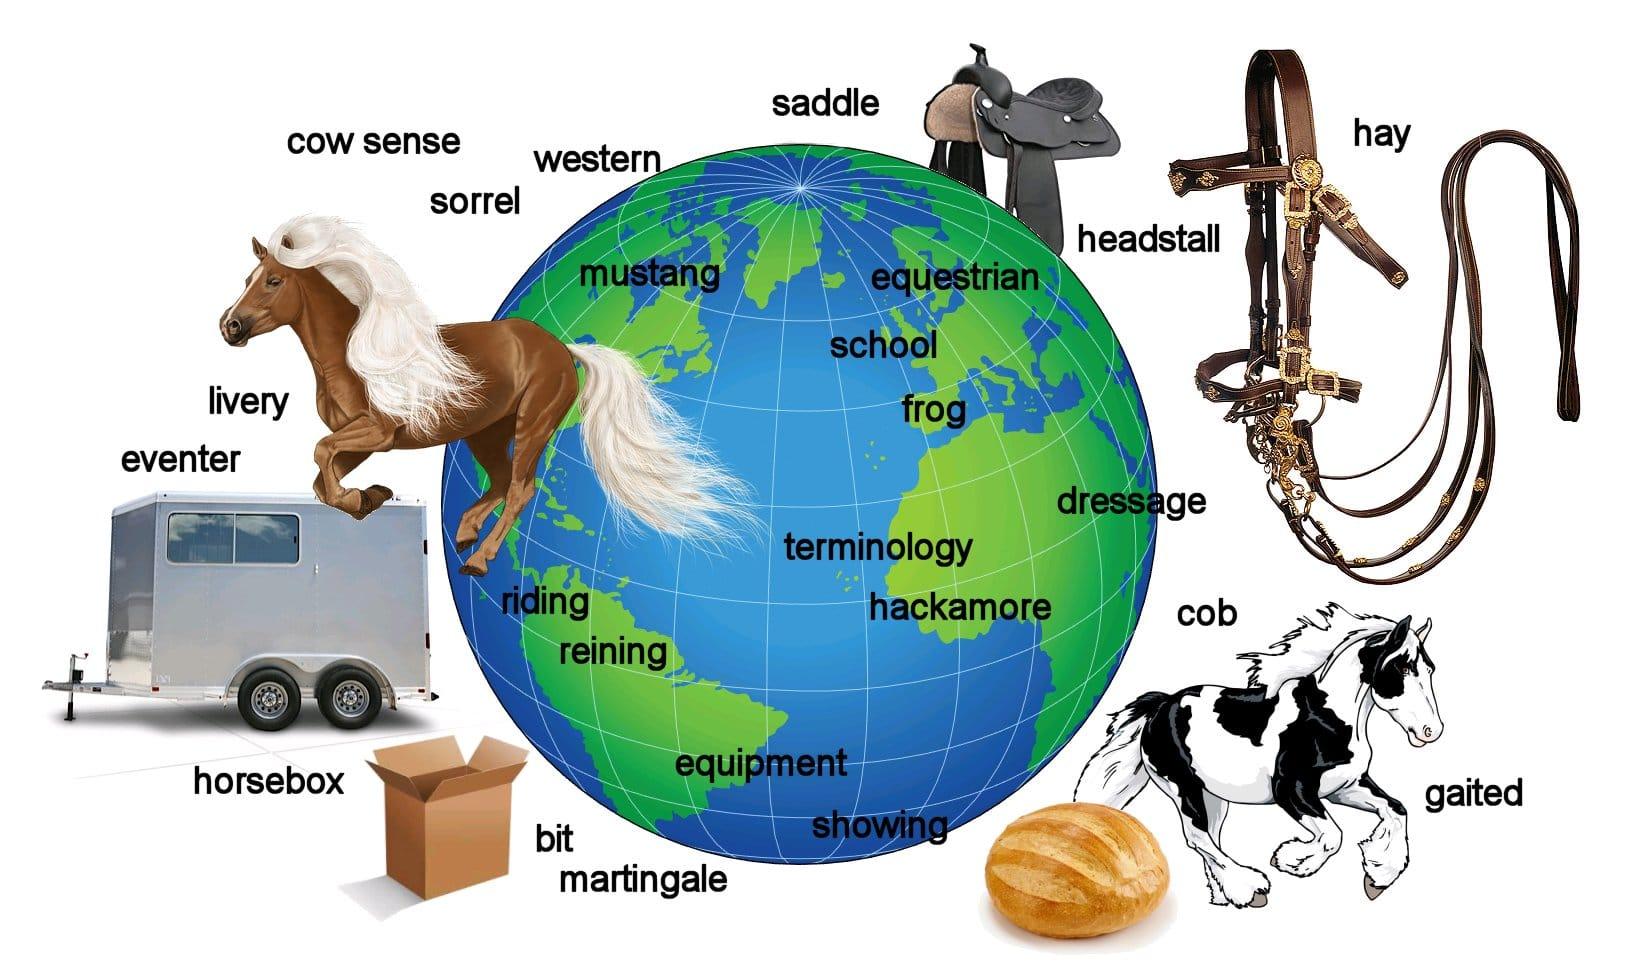 Quiz world equestrian terminology how international are you quiz world equestrian terminology how international are you good horse ccuart Images